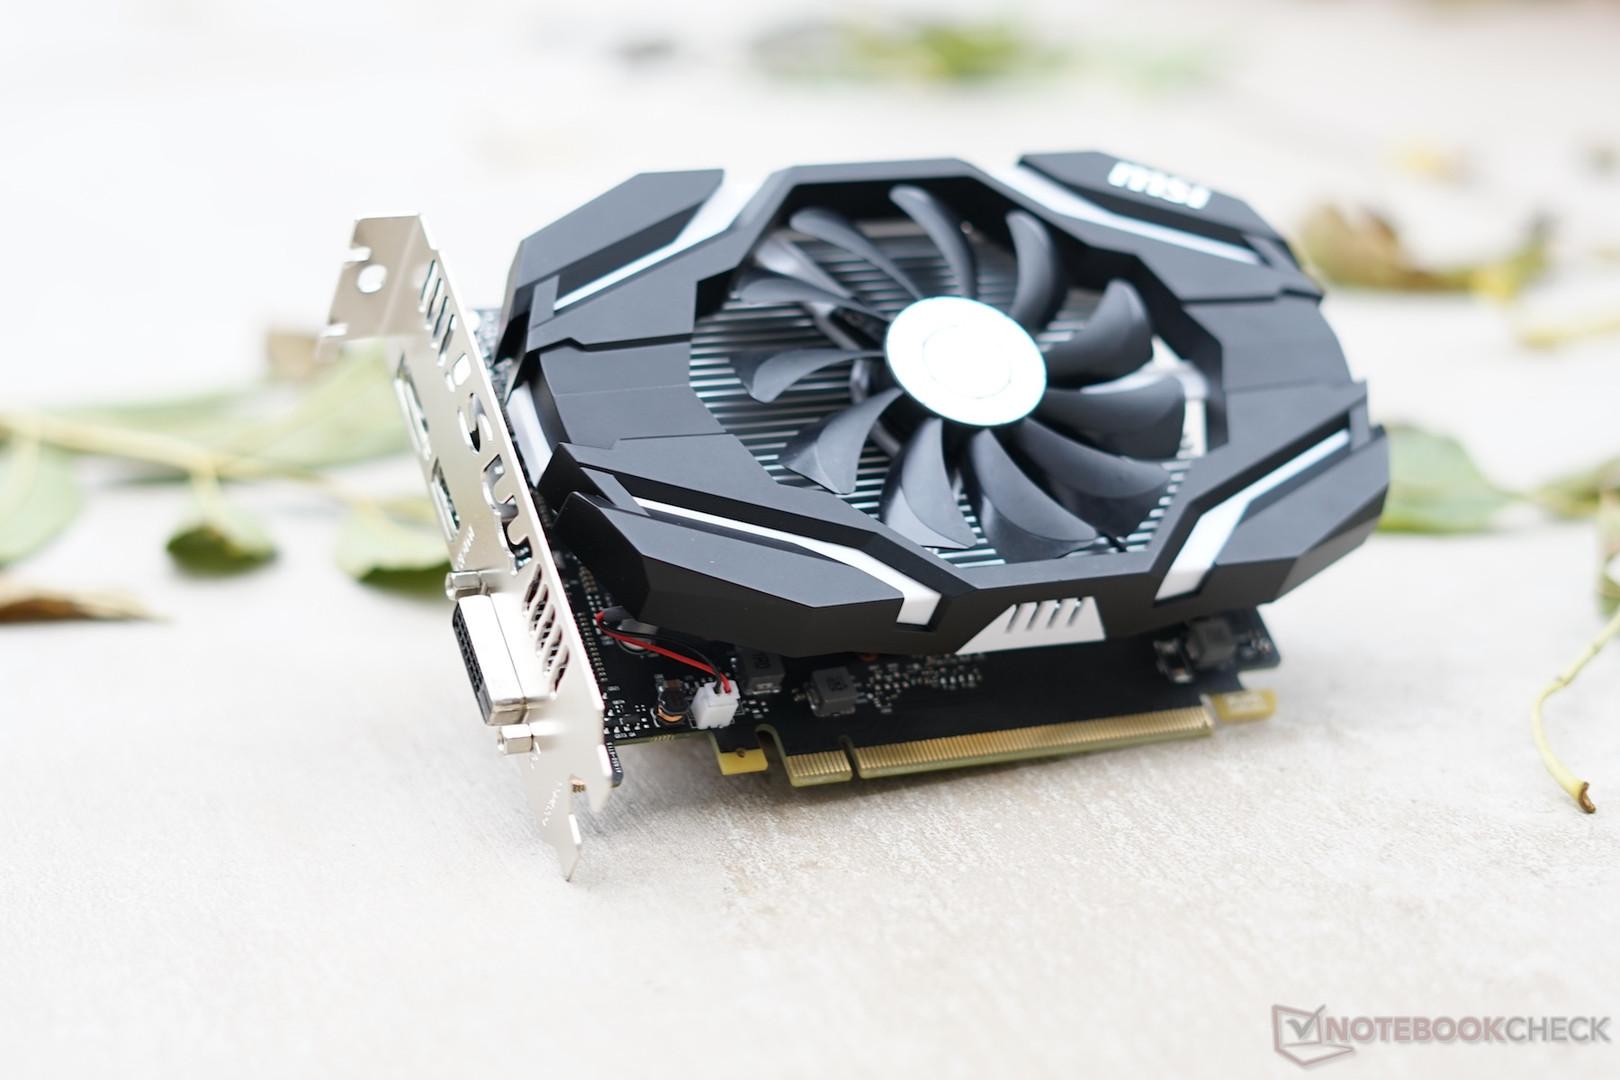 Test Msi Geforce Gtx 1050 Ti 4g Tests 4gb Ddr5 Oc Full Resolution